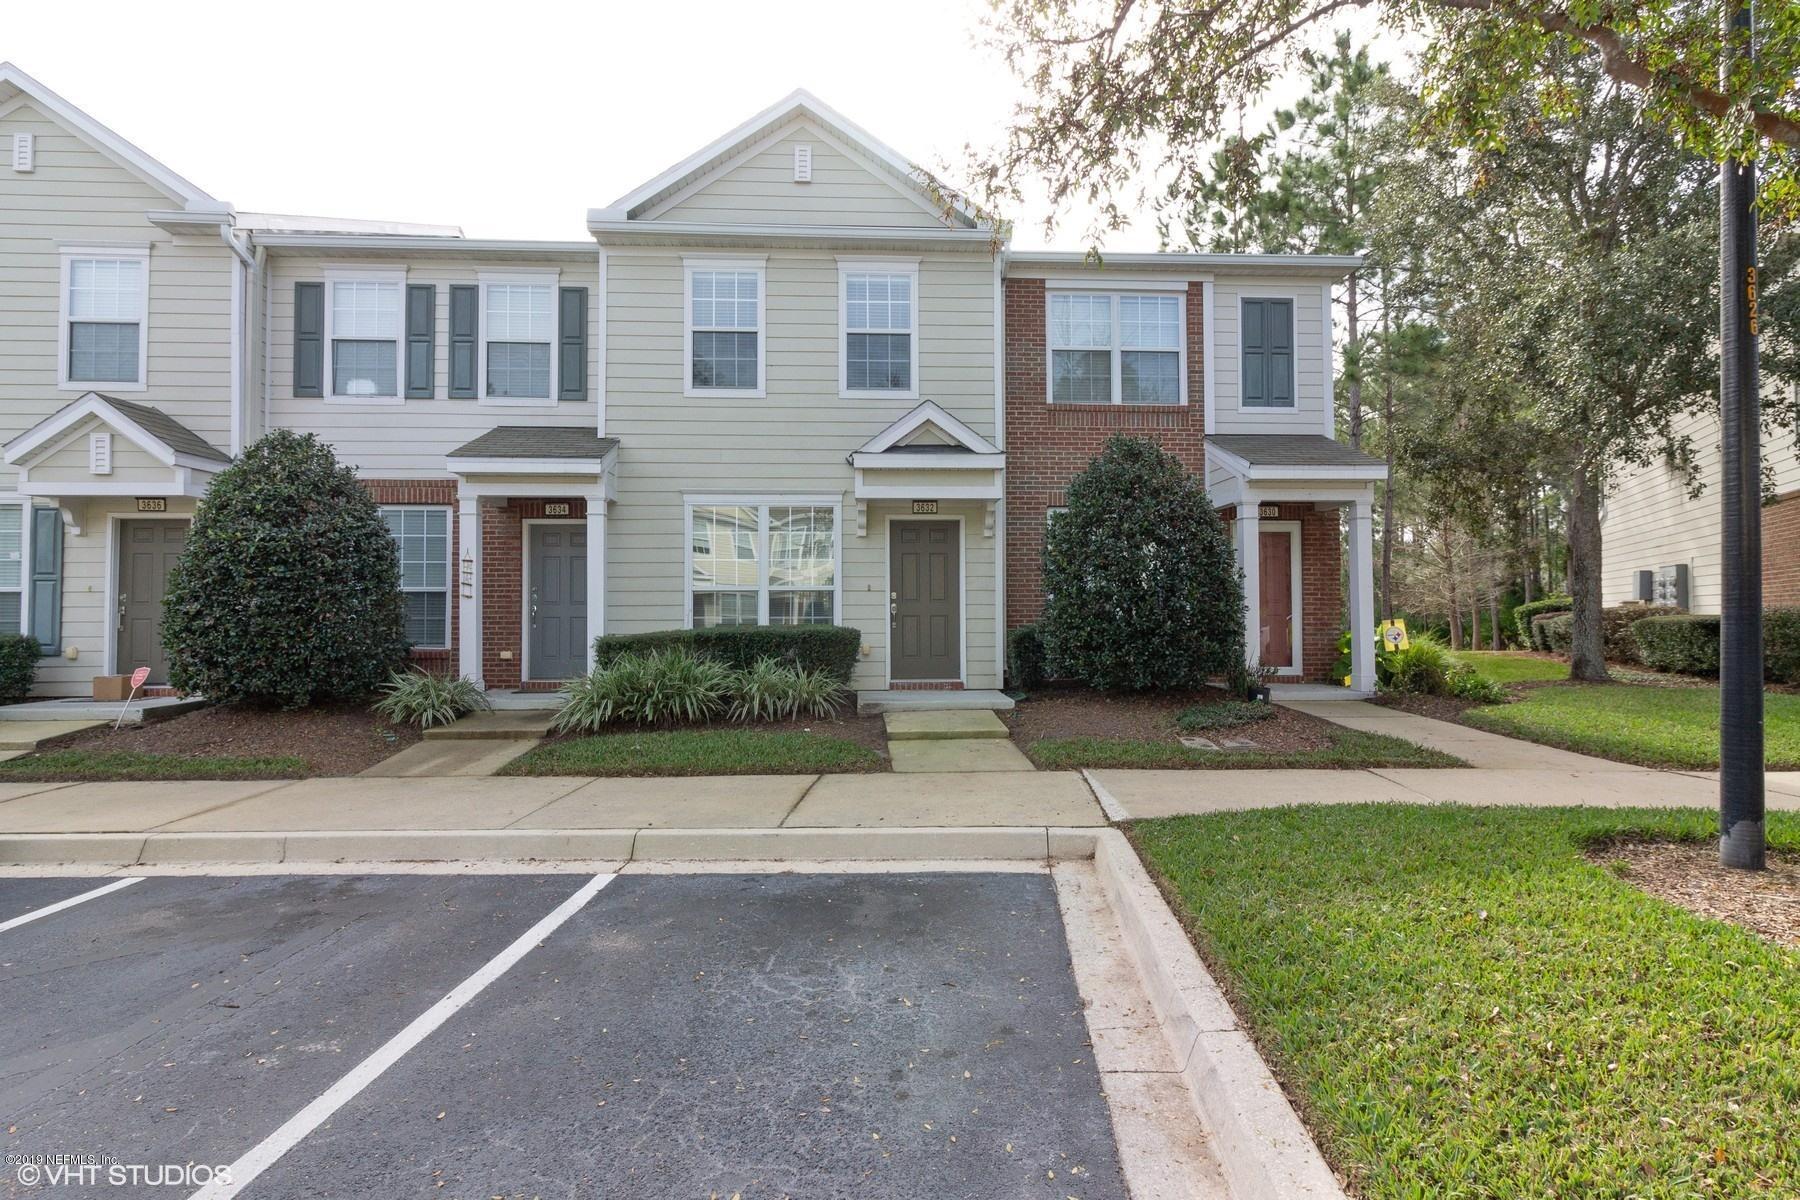 3632 Summerlin Ln Jacksonville, FL 32224